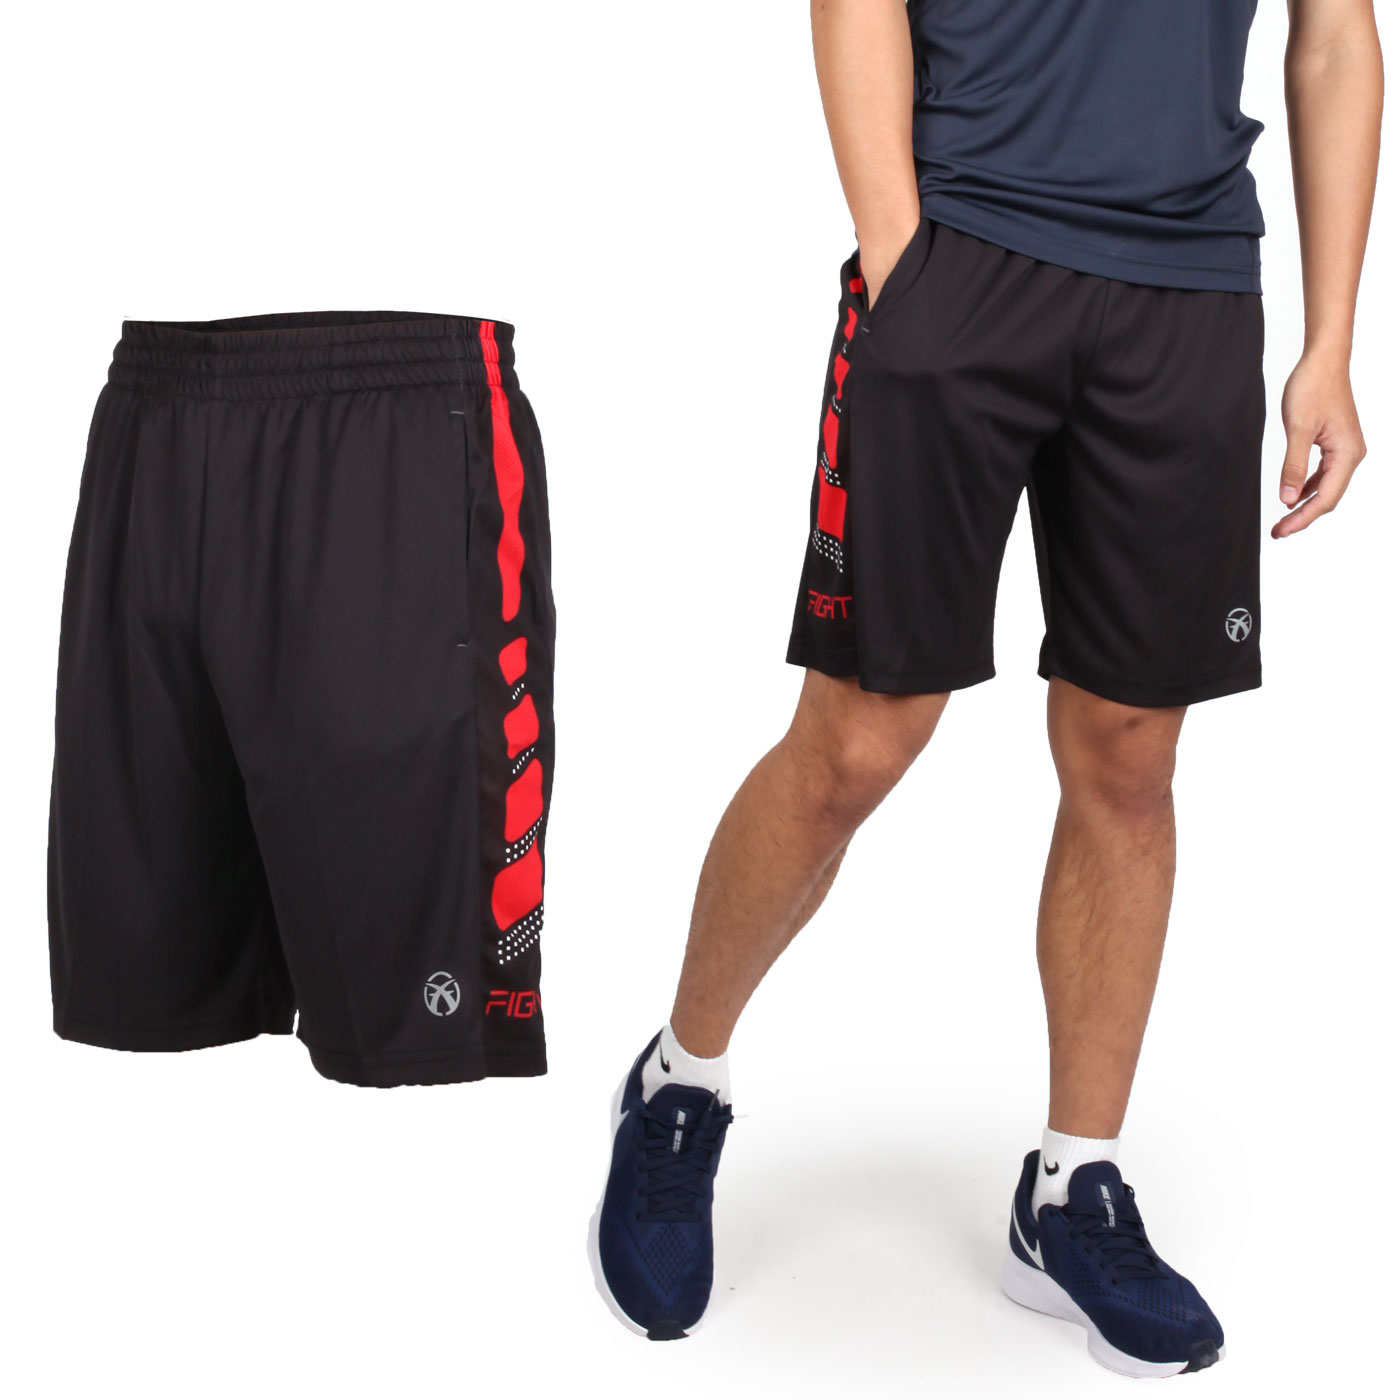 FIRESTAR 男款吸濕排汗籃球短褲 B9201-18 - 黑紅